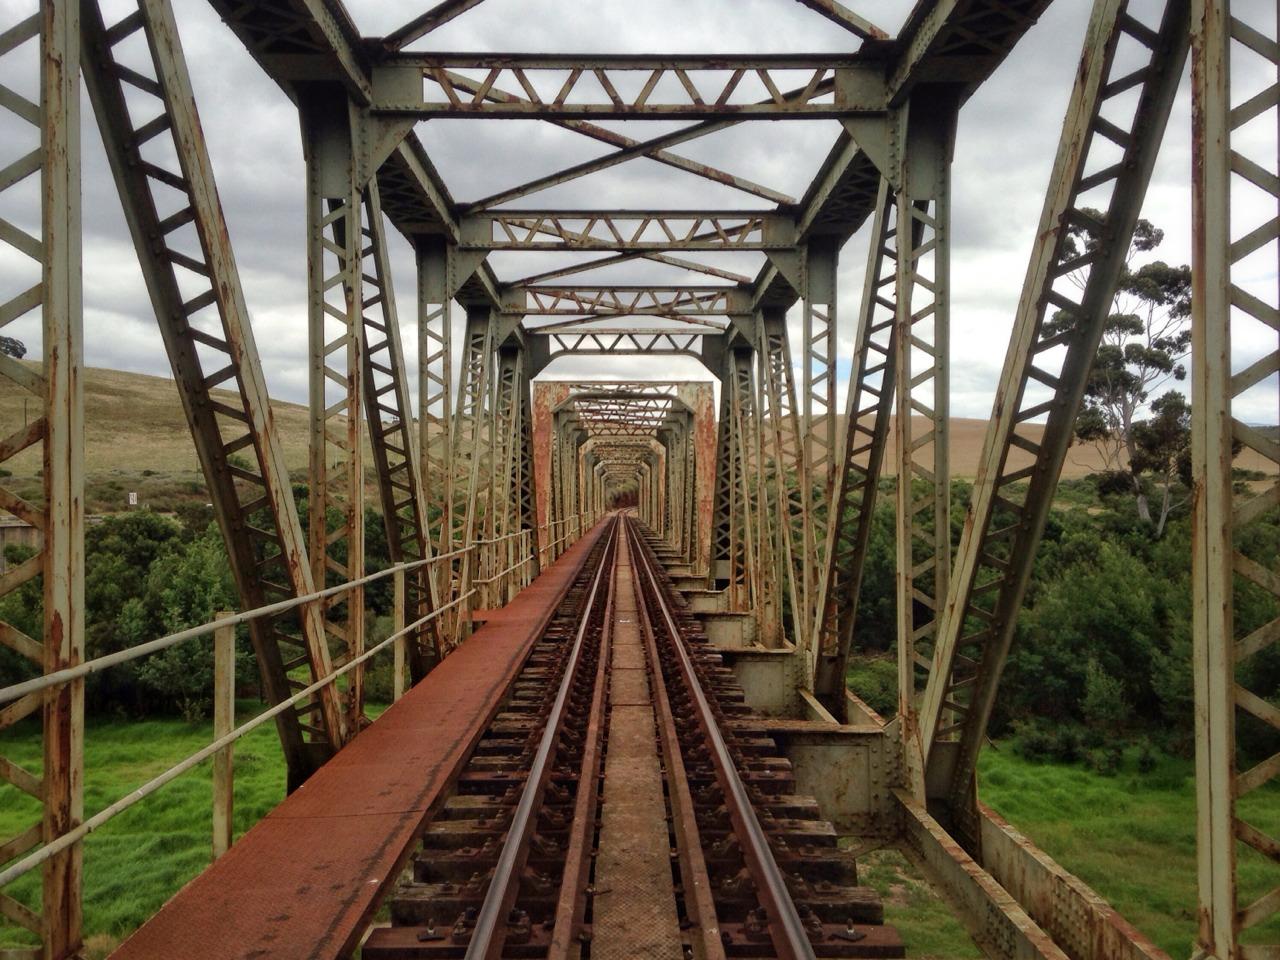 Secret Bridges || #LaterGram #SummerGoesBOS #iPhoneOnly || Garden Route, South Africa